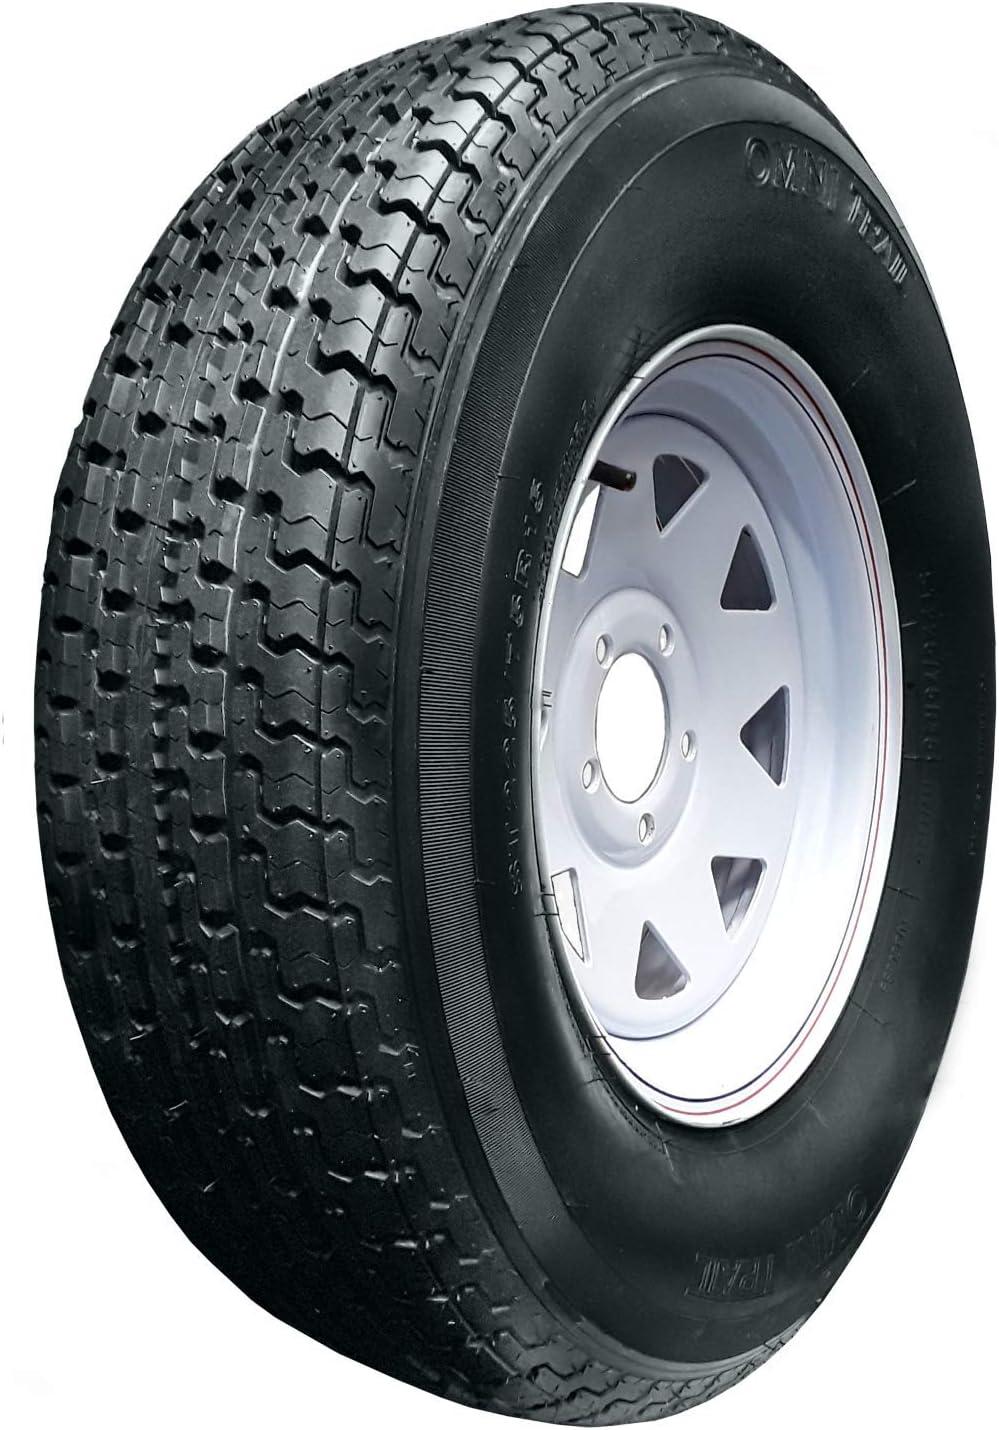 Omni Trail Trailer Radial Tire-ST205//75R14 105L 8-ply